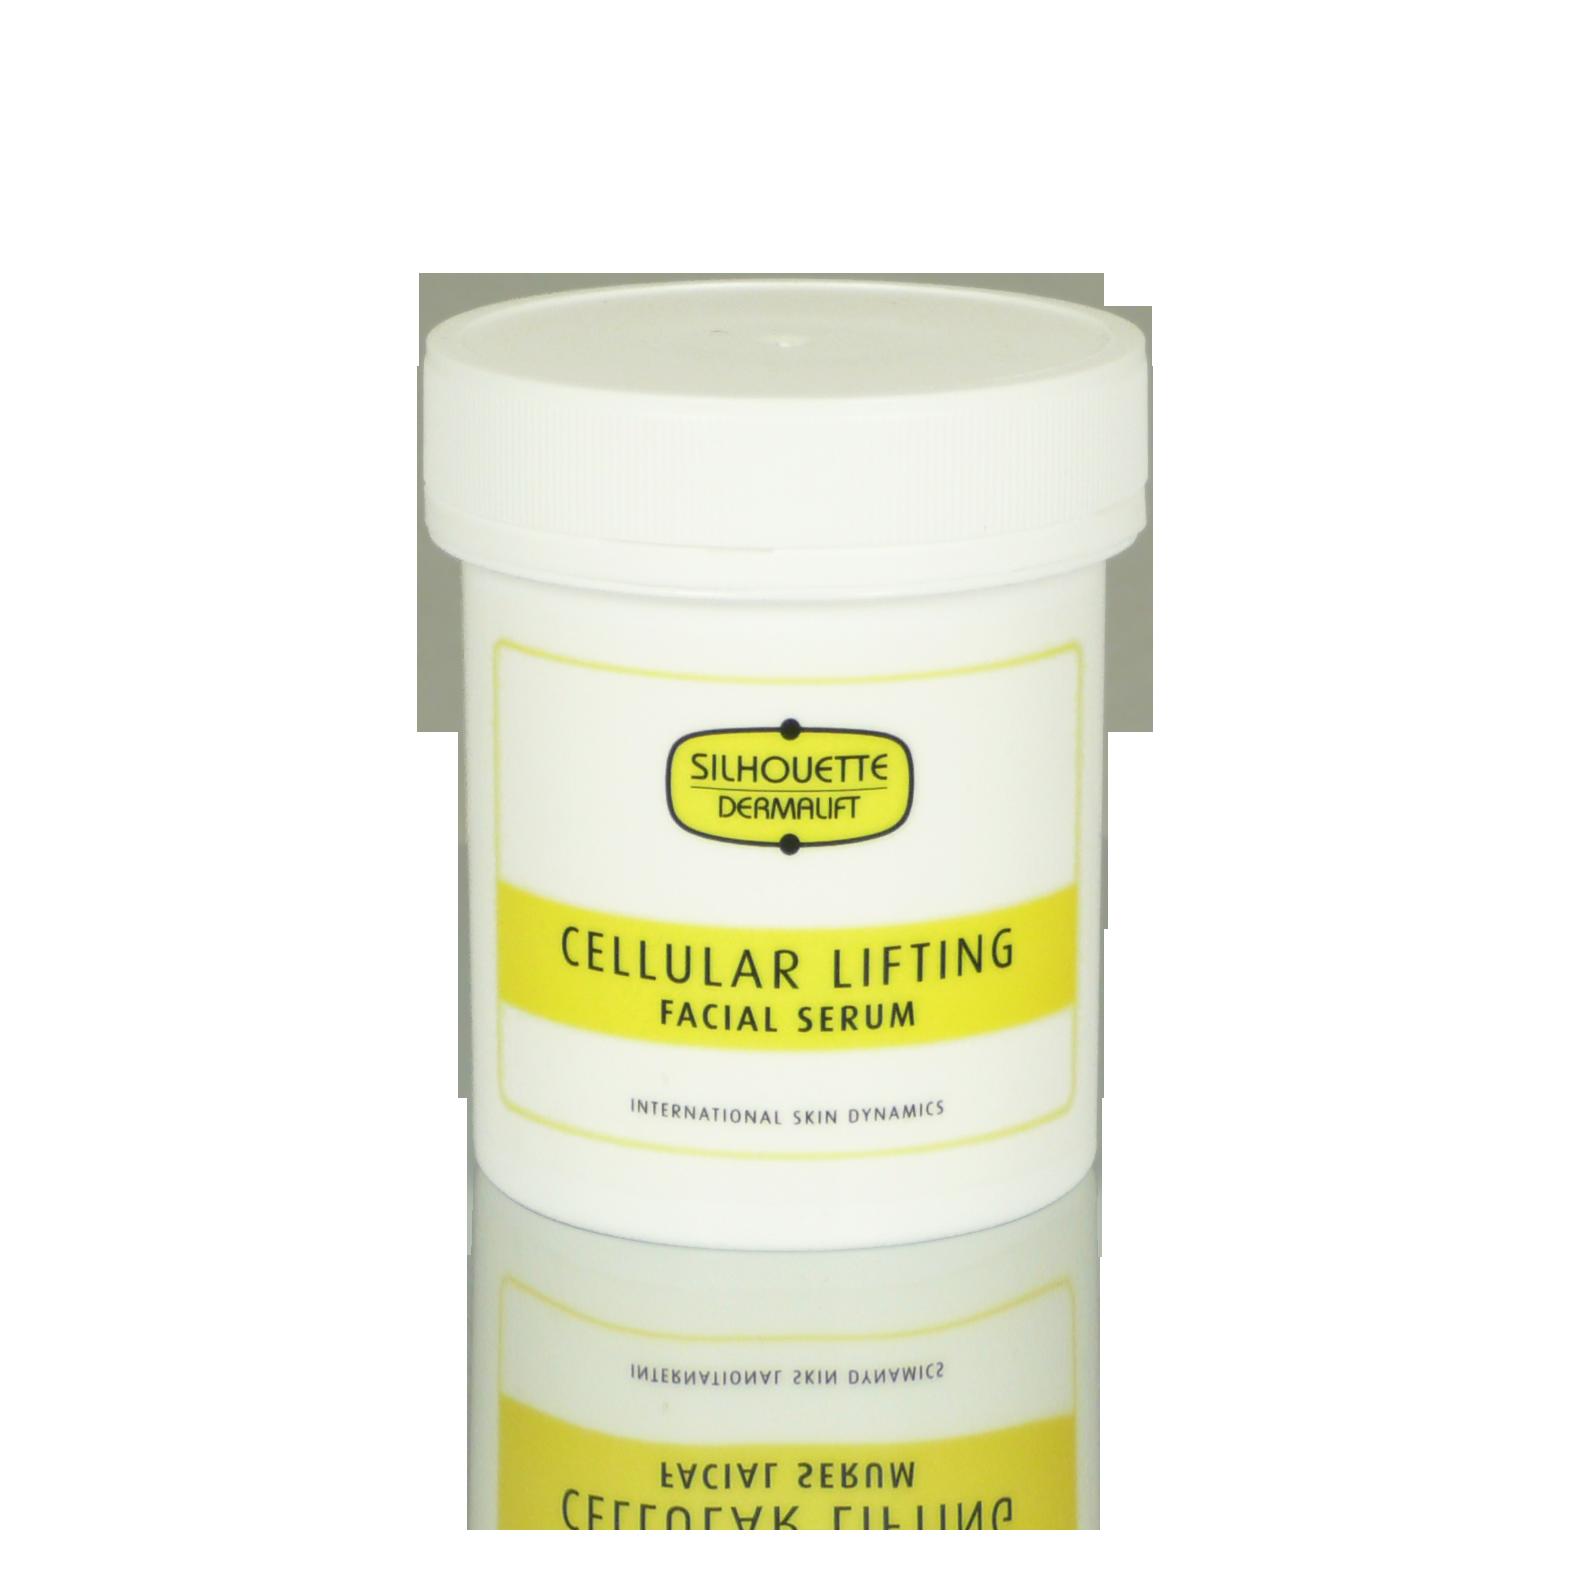 Cellular Lifting Serum